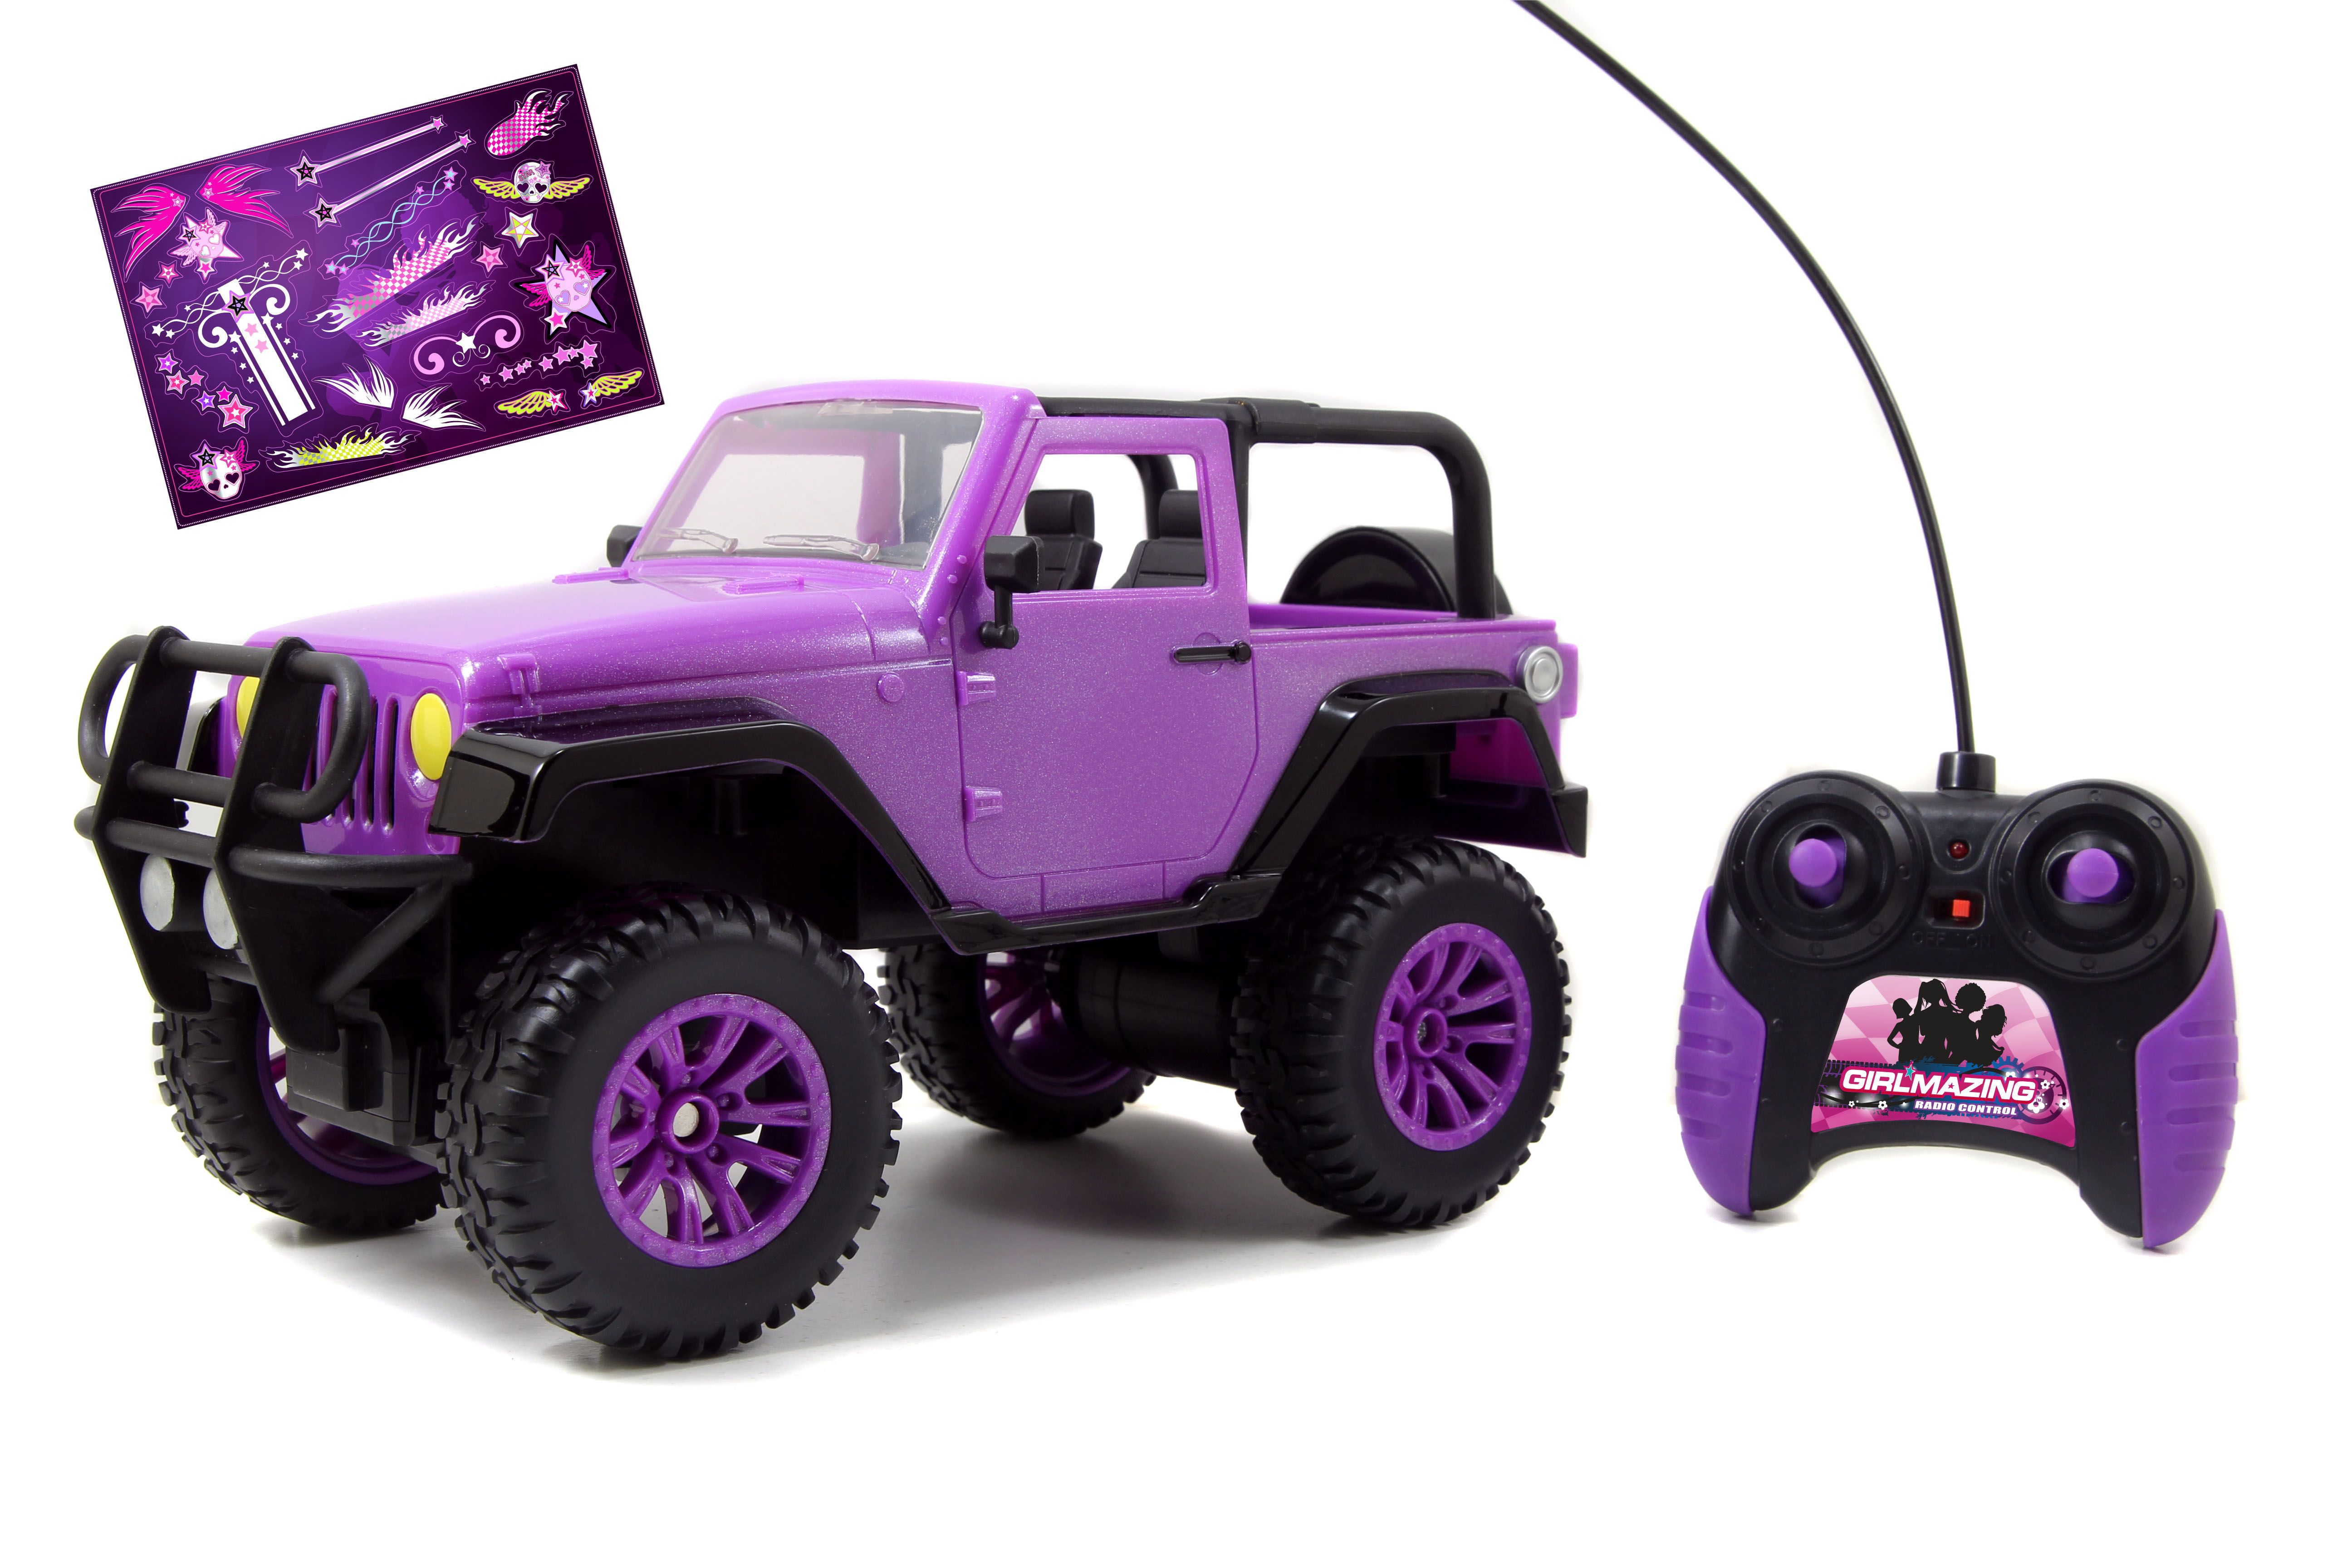 Jada car toys  Girlmazing Remote Control Cars by Jada Toys  Room  Pinterest  Room